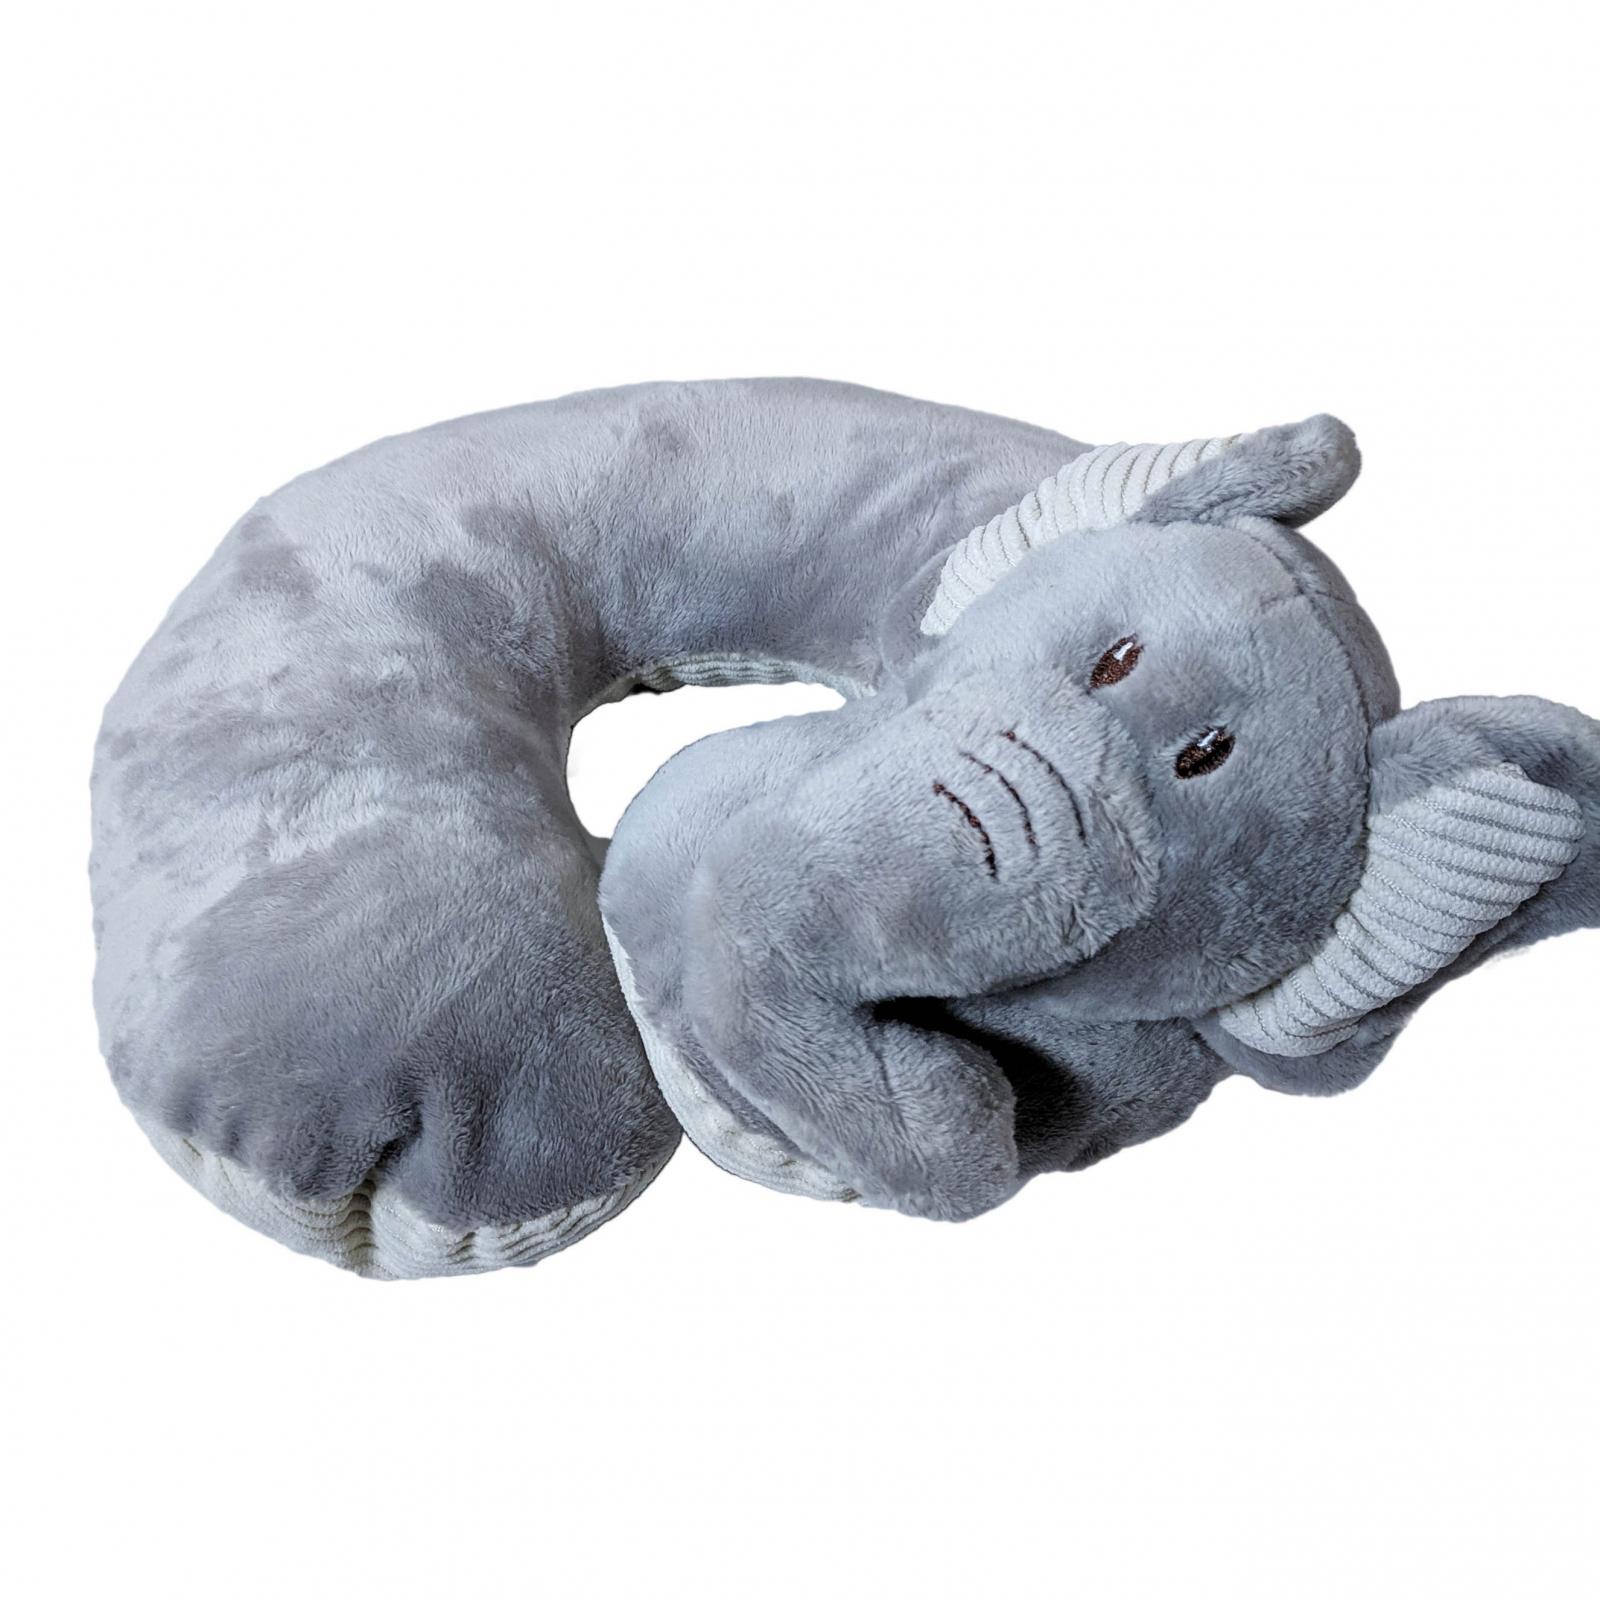 TychoTyke Baby Neck Pillow Soft Plush Grey Elephant Design